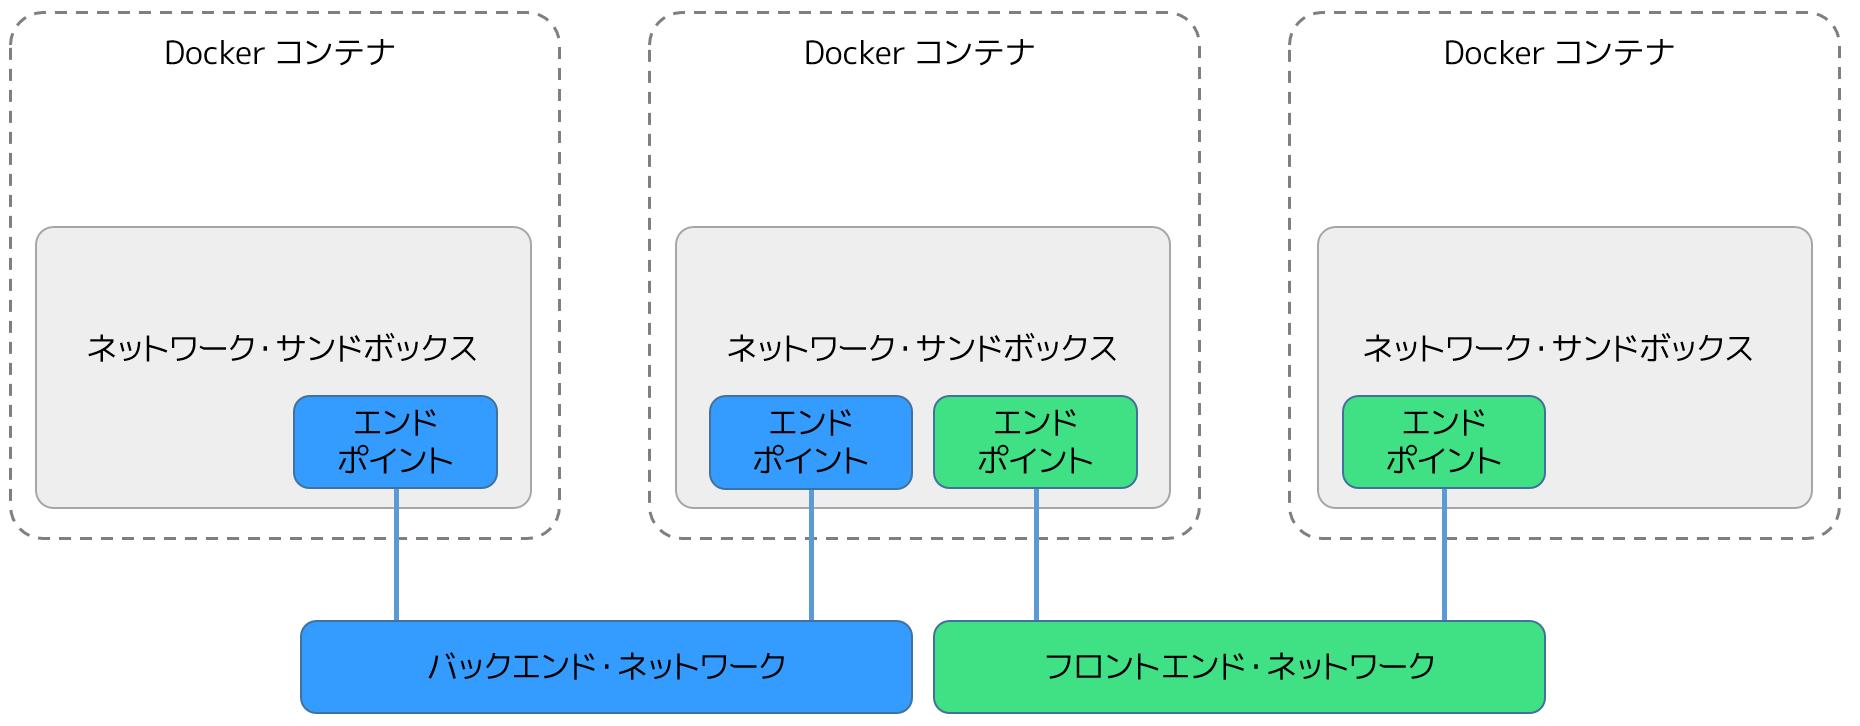 docker-network01.png